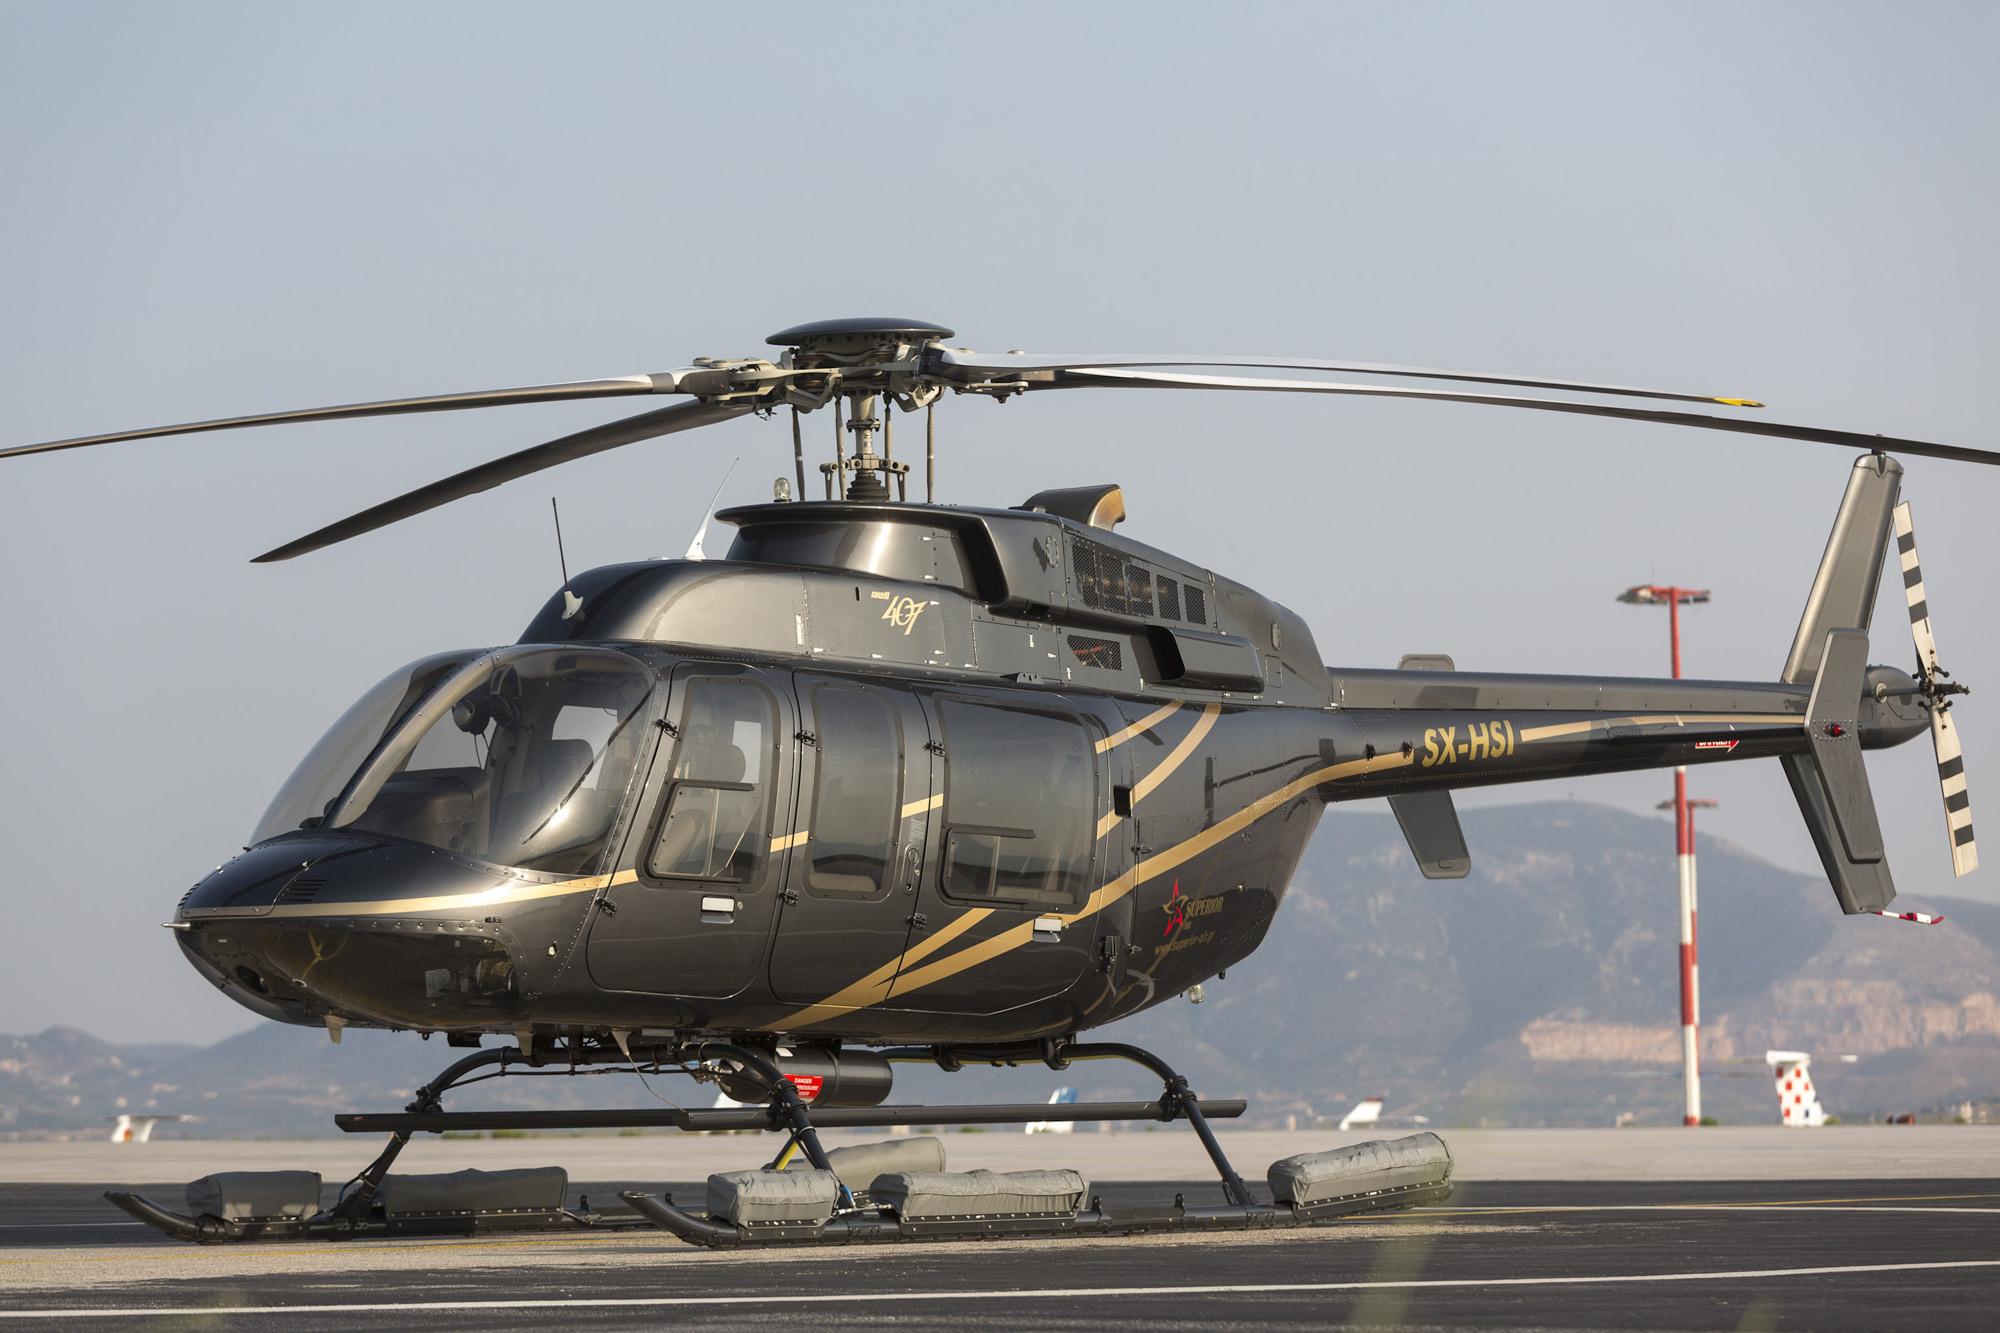 Superior Air Bell 407